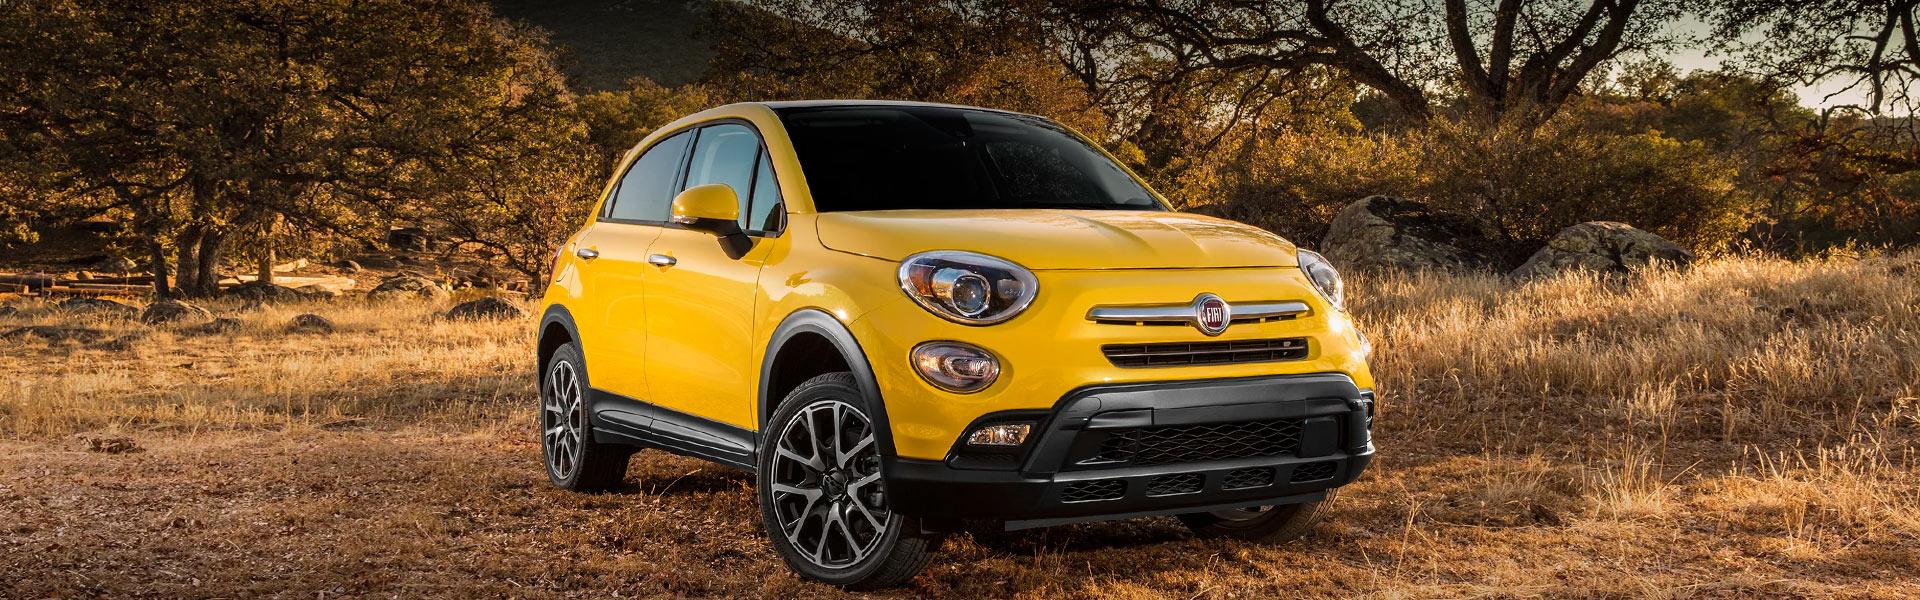 Замена жидкости гур Fiat